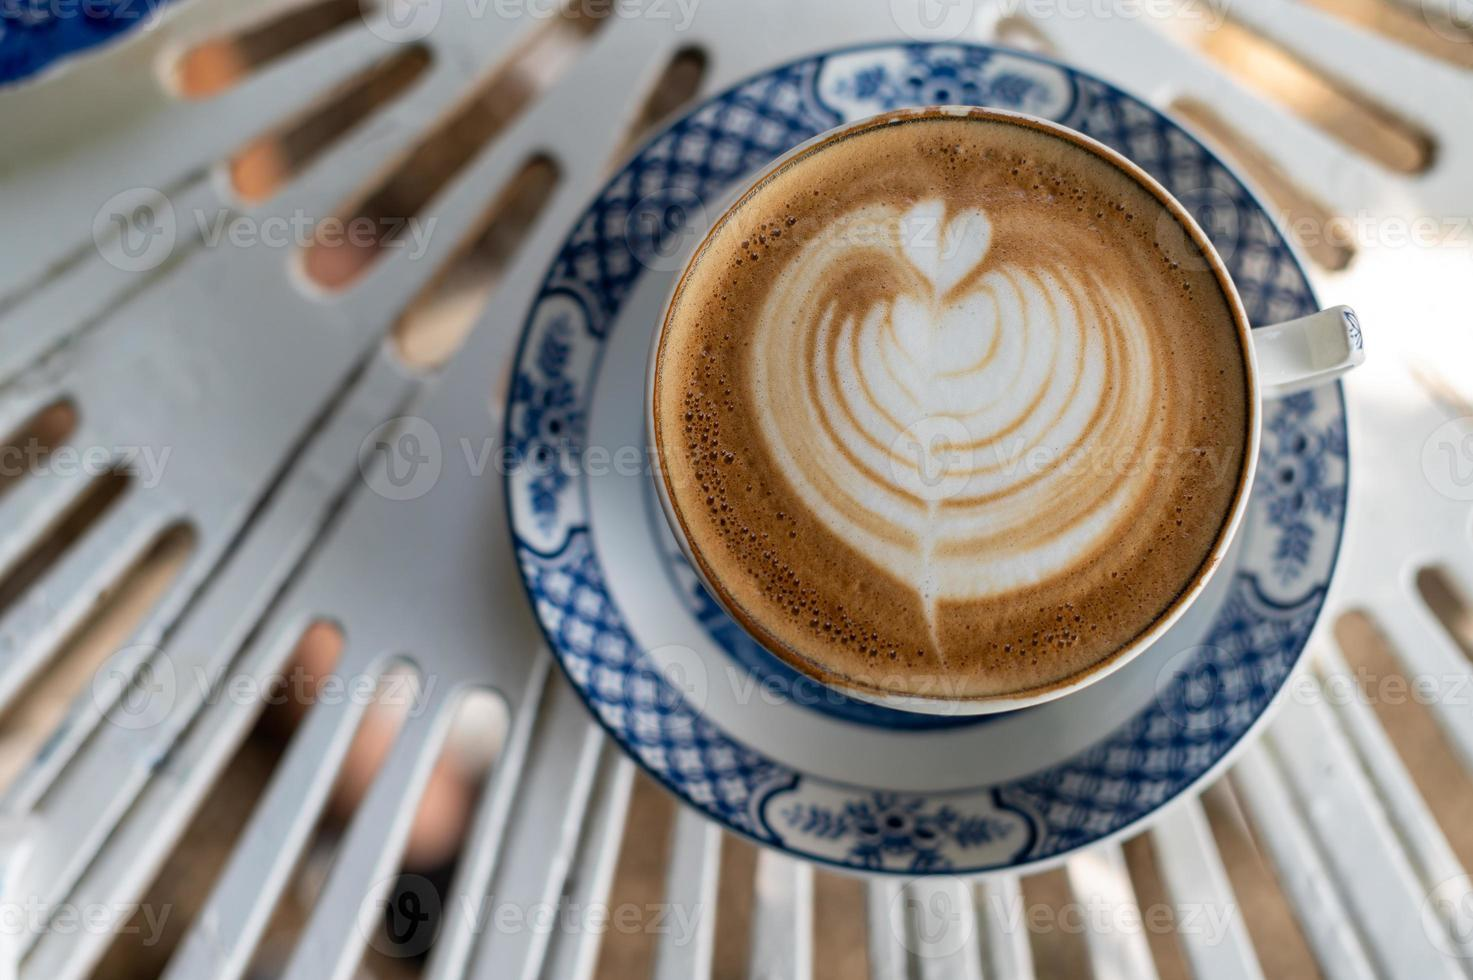 latte art en una taza de café en la mesa plana laical foto